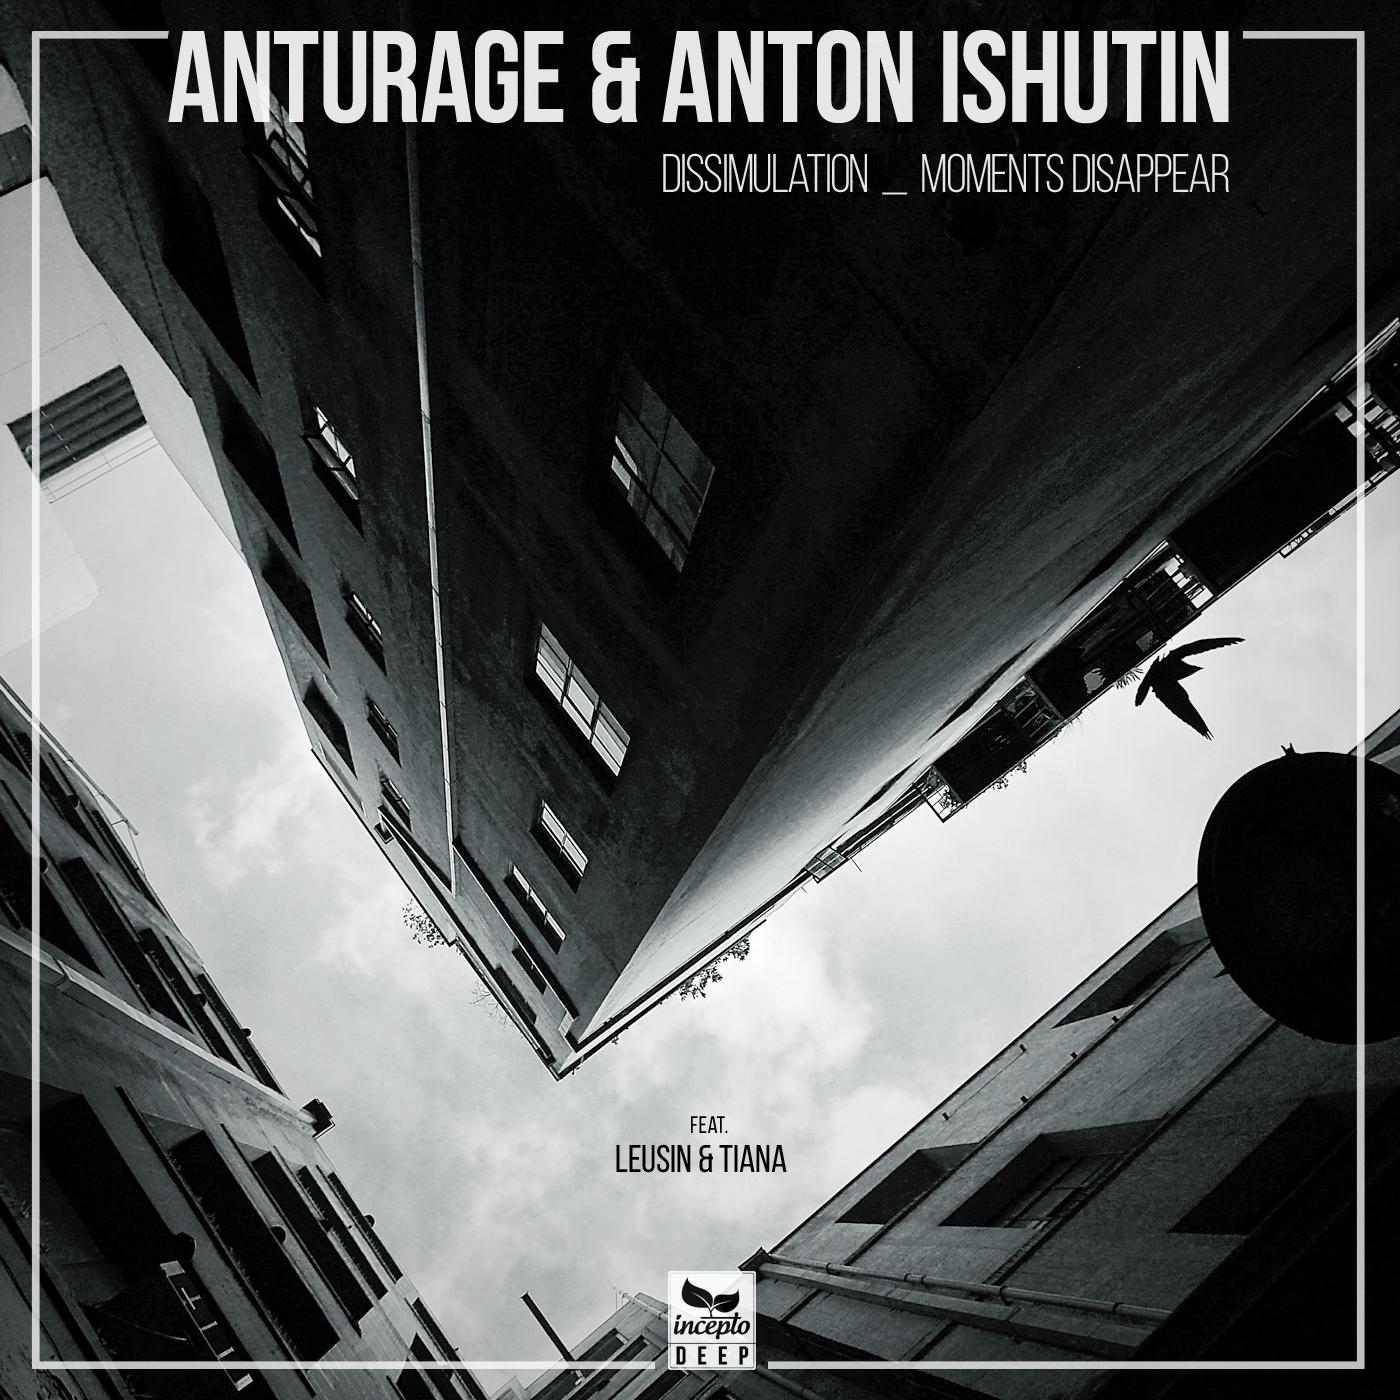 Anturage & Anton Ishutin, Tiana - Moments Disappear (Original Mix)